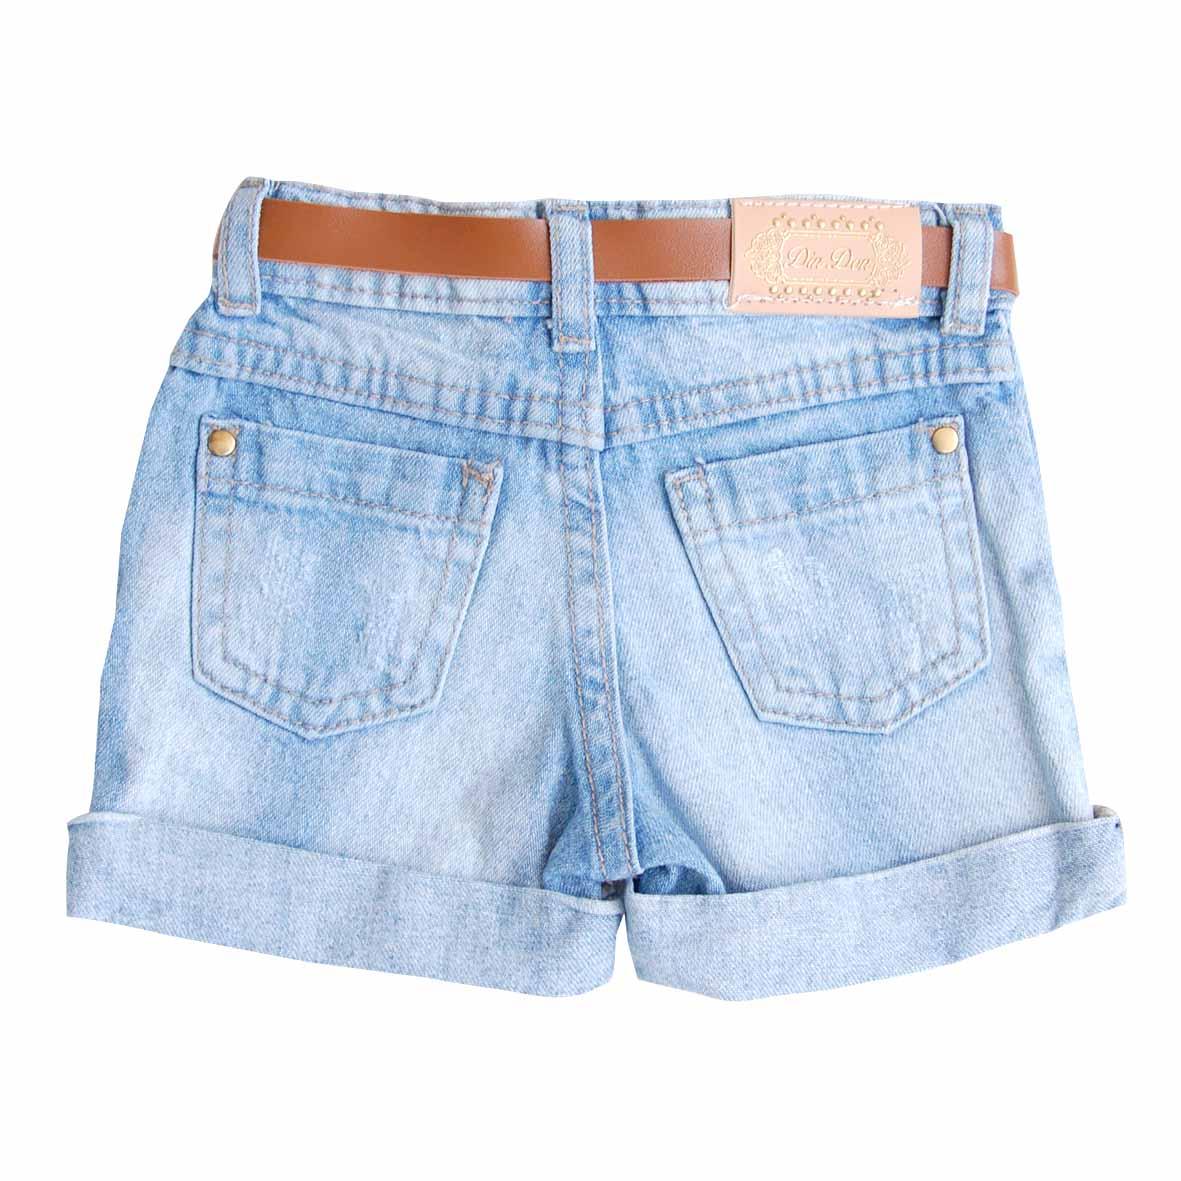 Shorts Menina Jeans com cinto   DIN DON